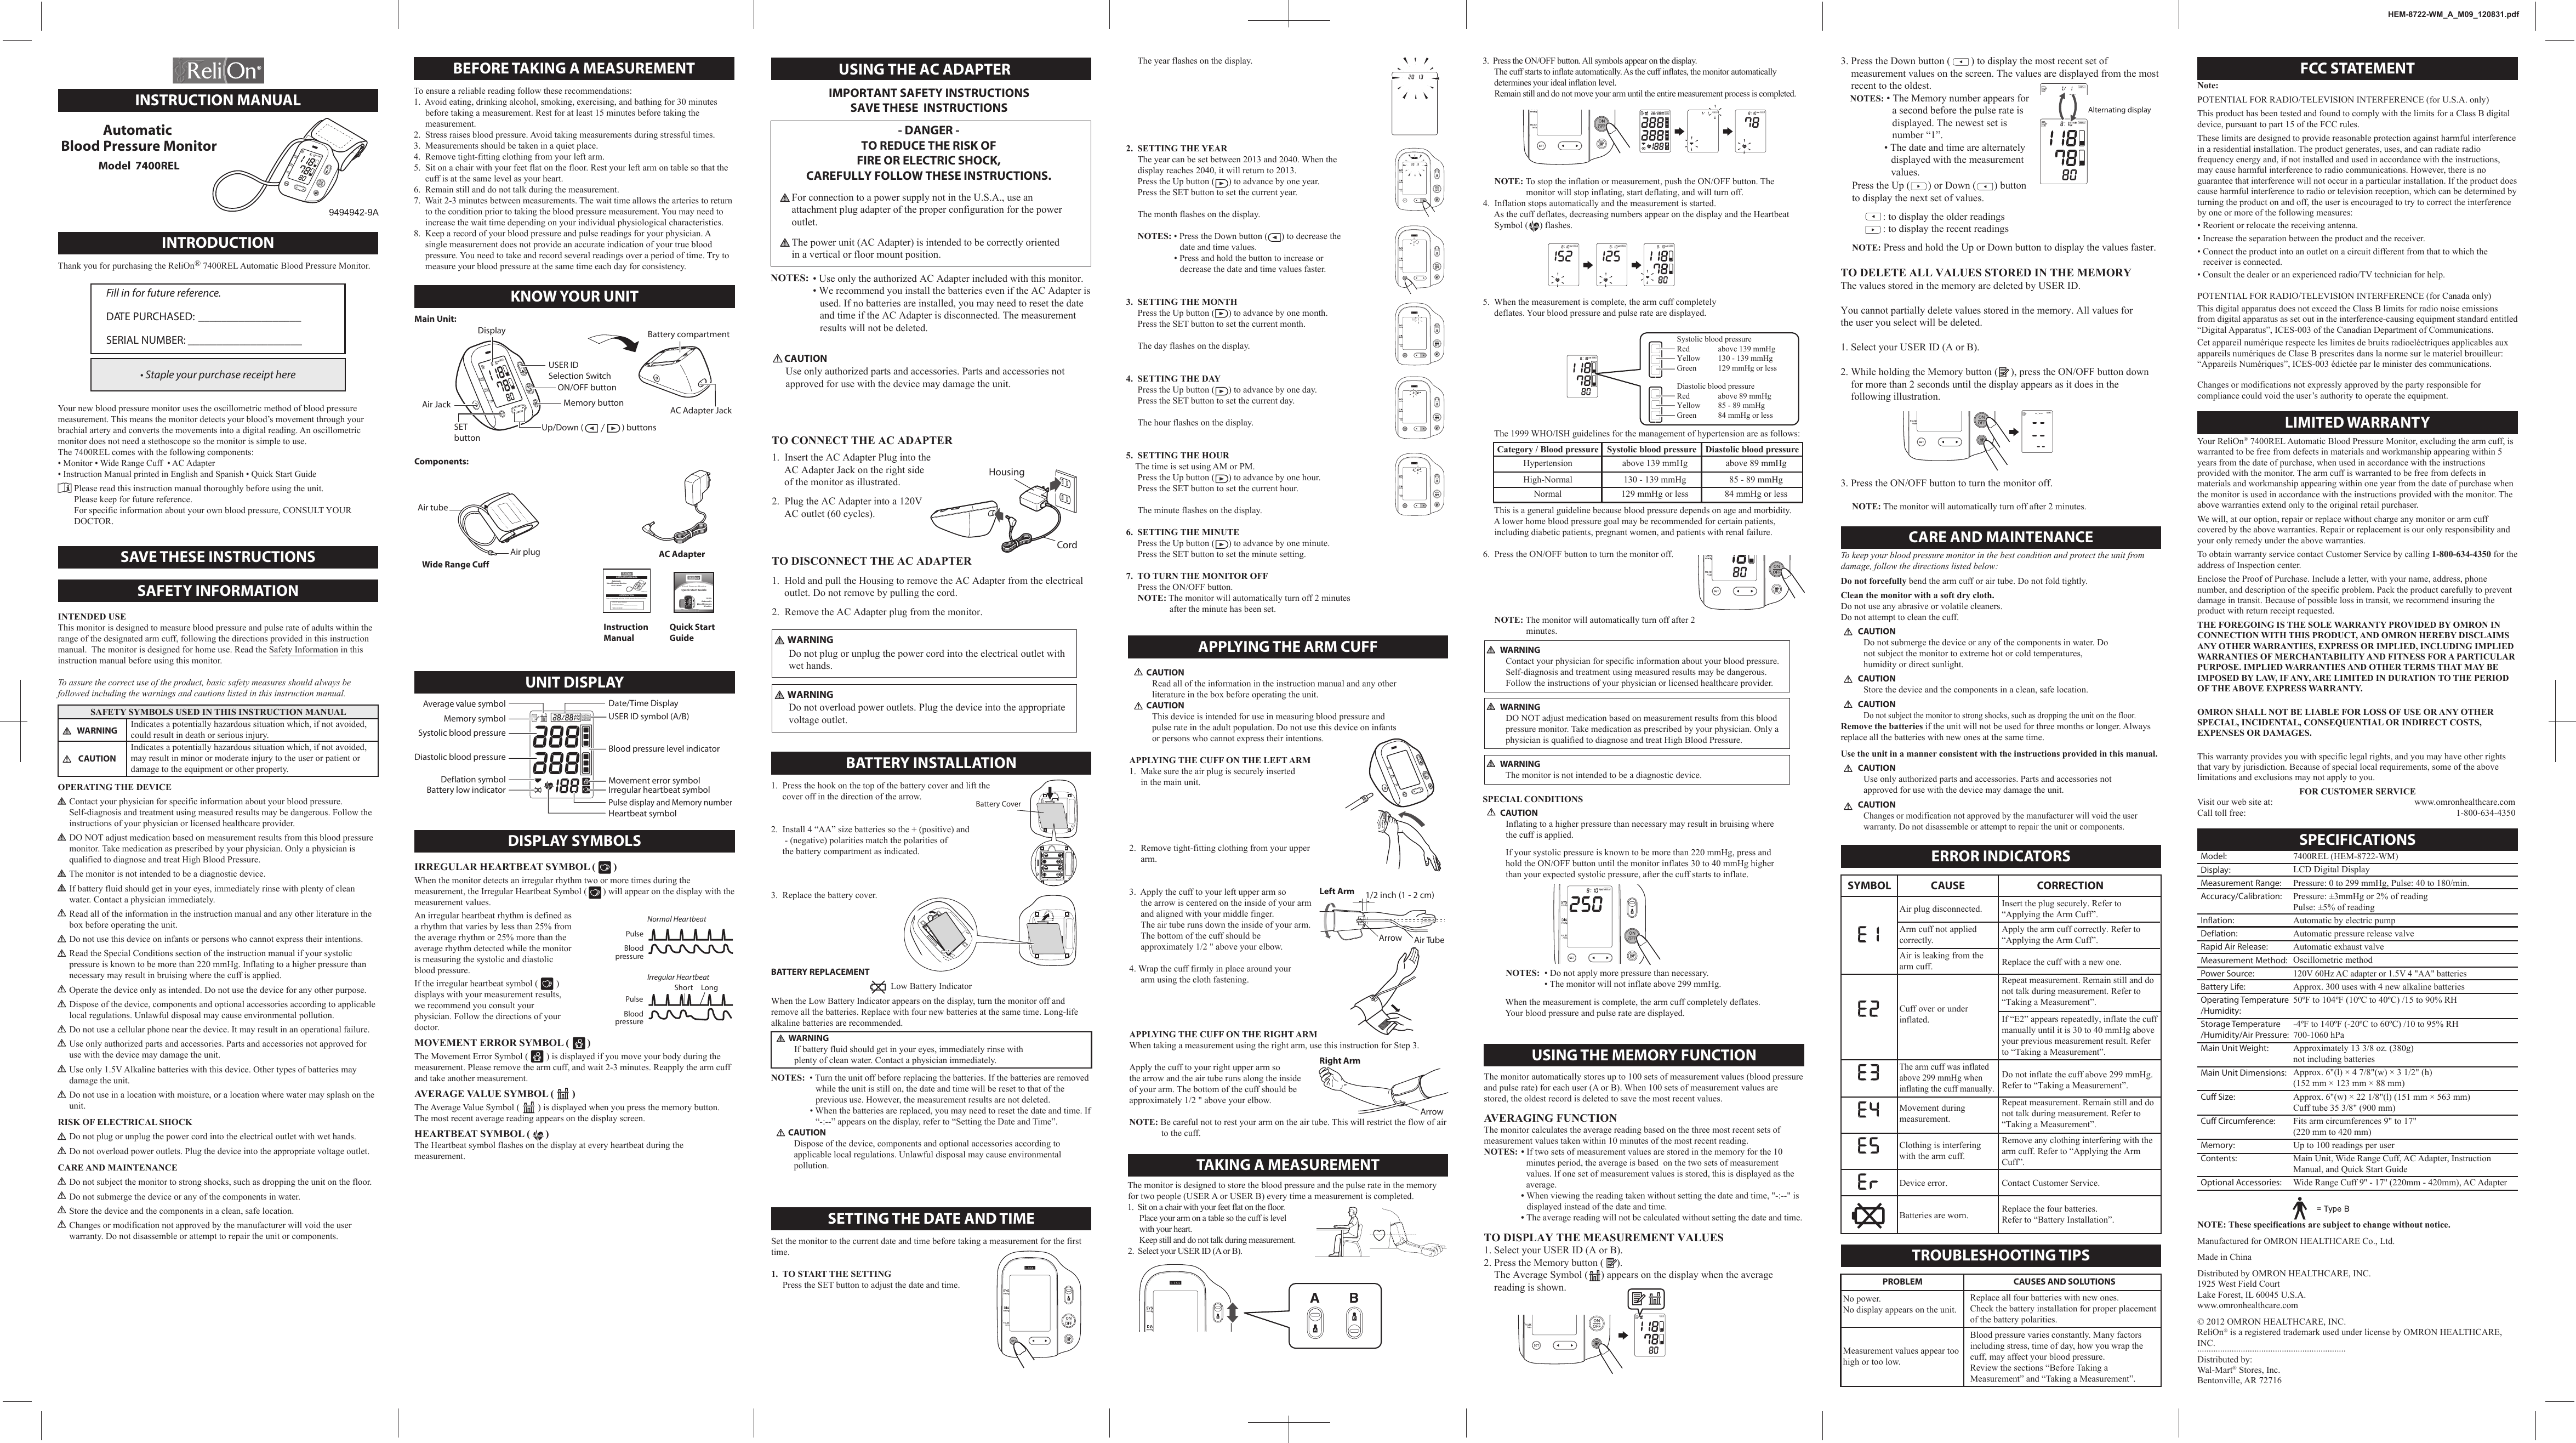 Relion Bp300 Owner S Manual 0831hem 8722 Wmam02eng